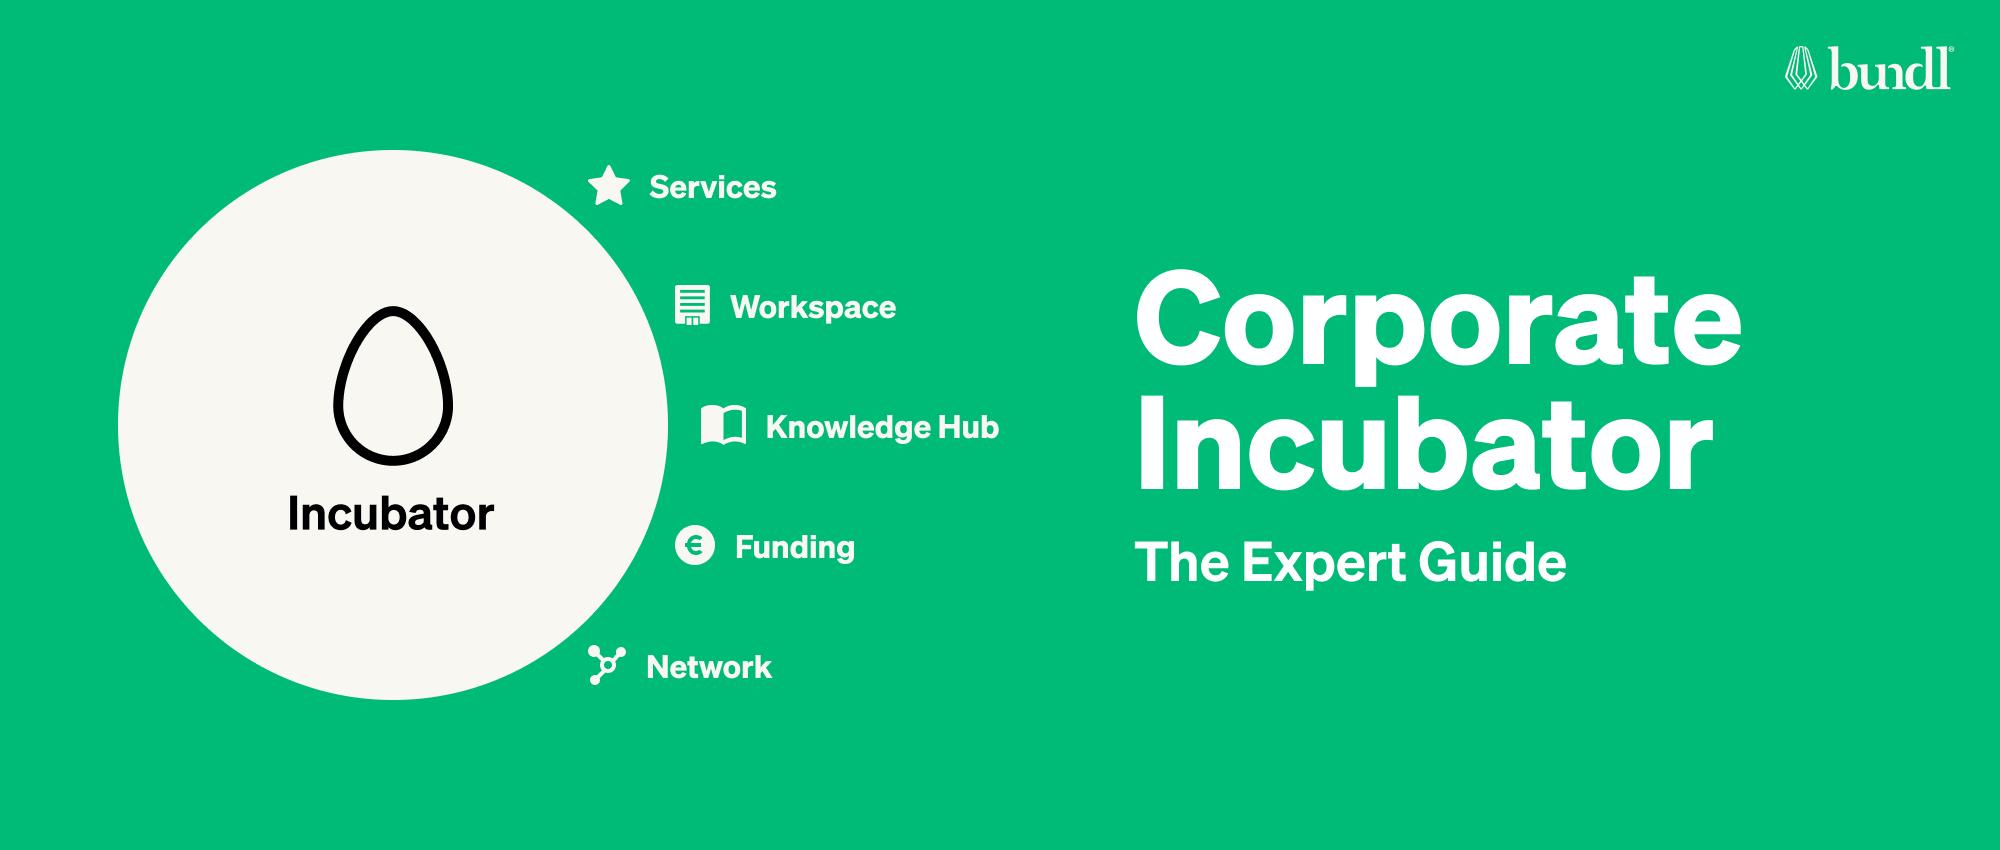 Corporate Incubators: The Expert Guide.